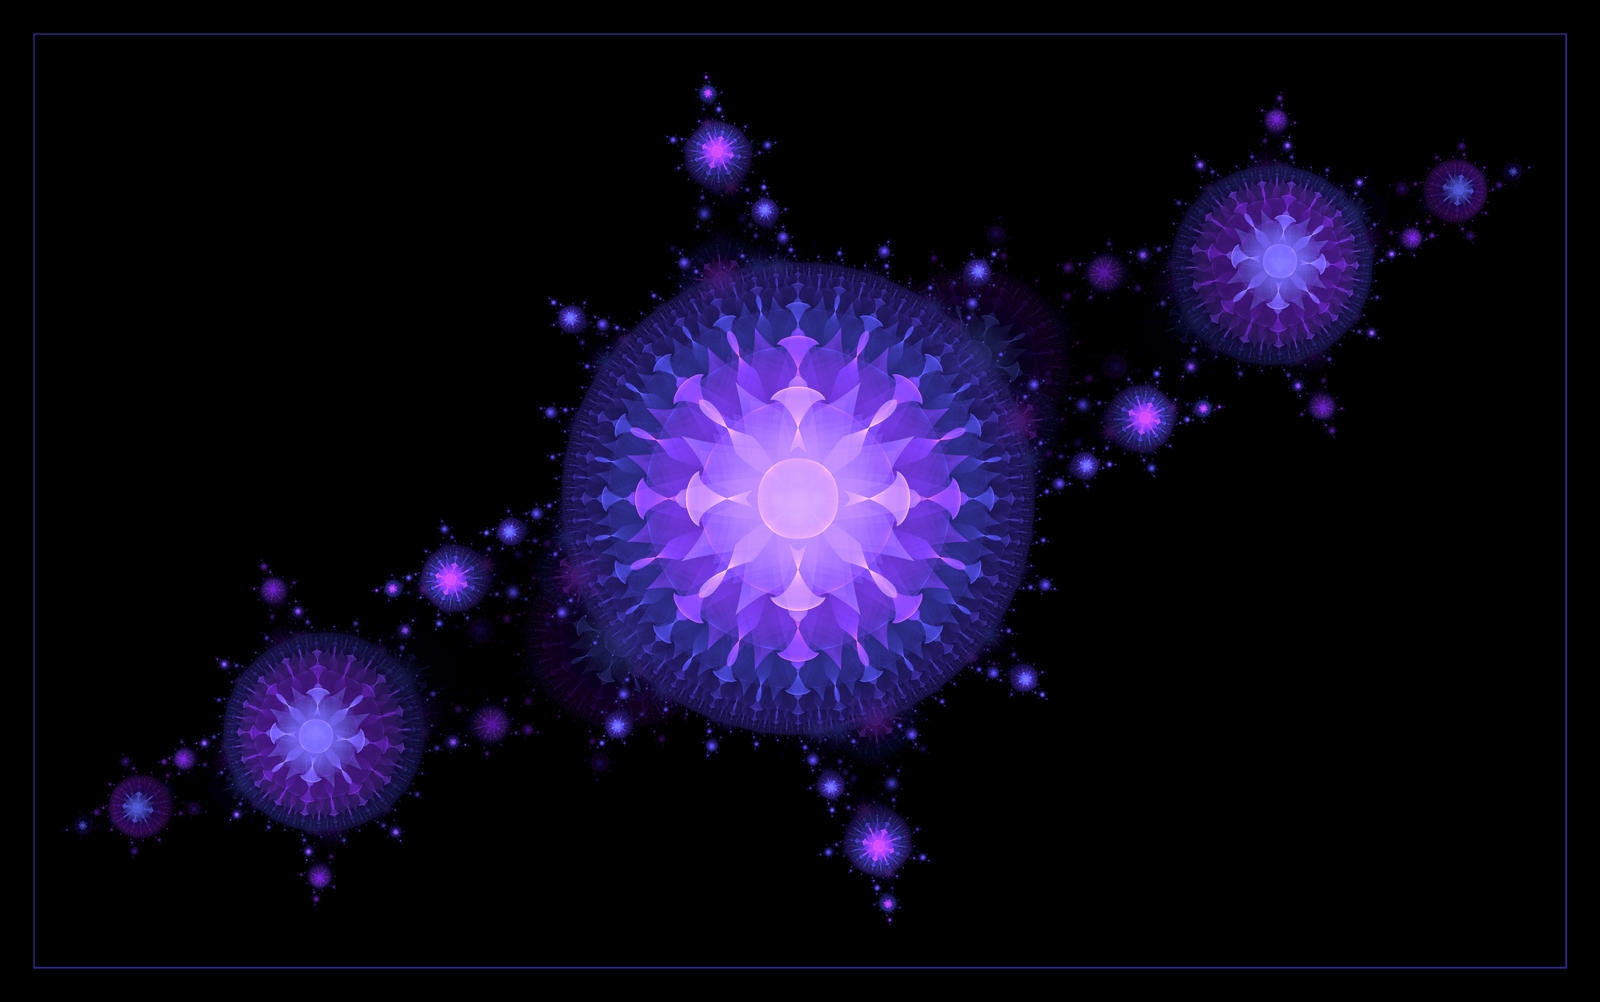 Sky of Stars by DeepChrome